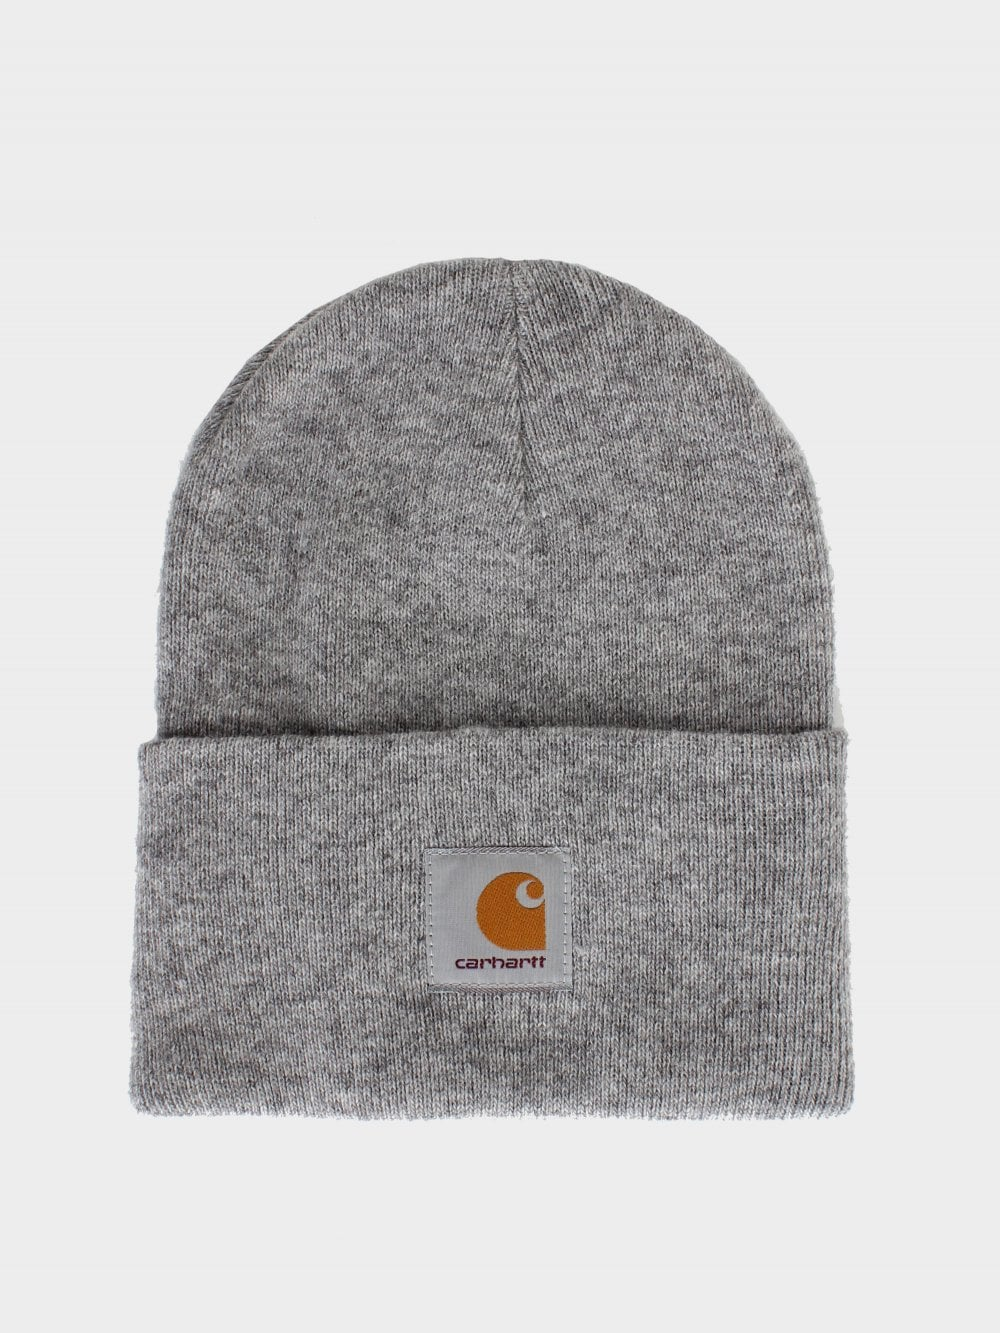 d294d6e9e8cc Carhartt Acrylic Watch Hat in Grey